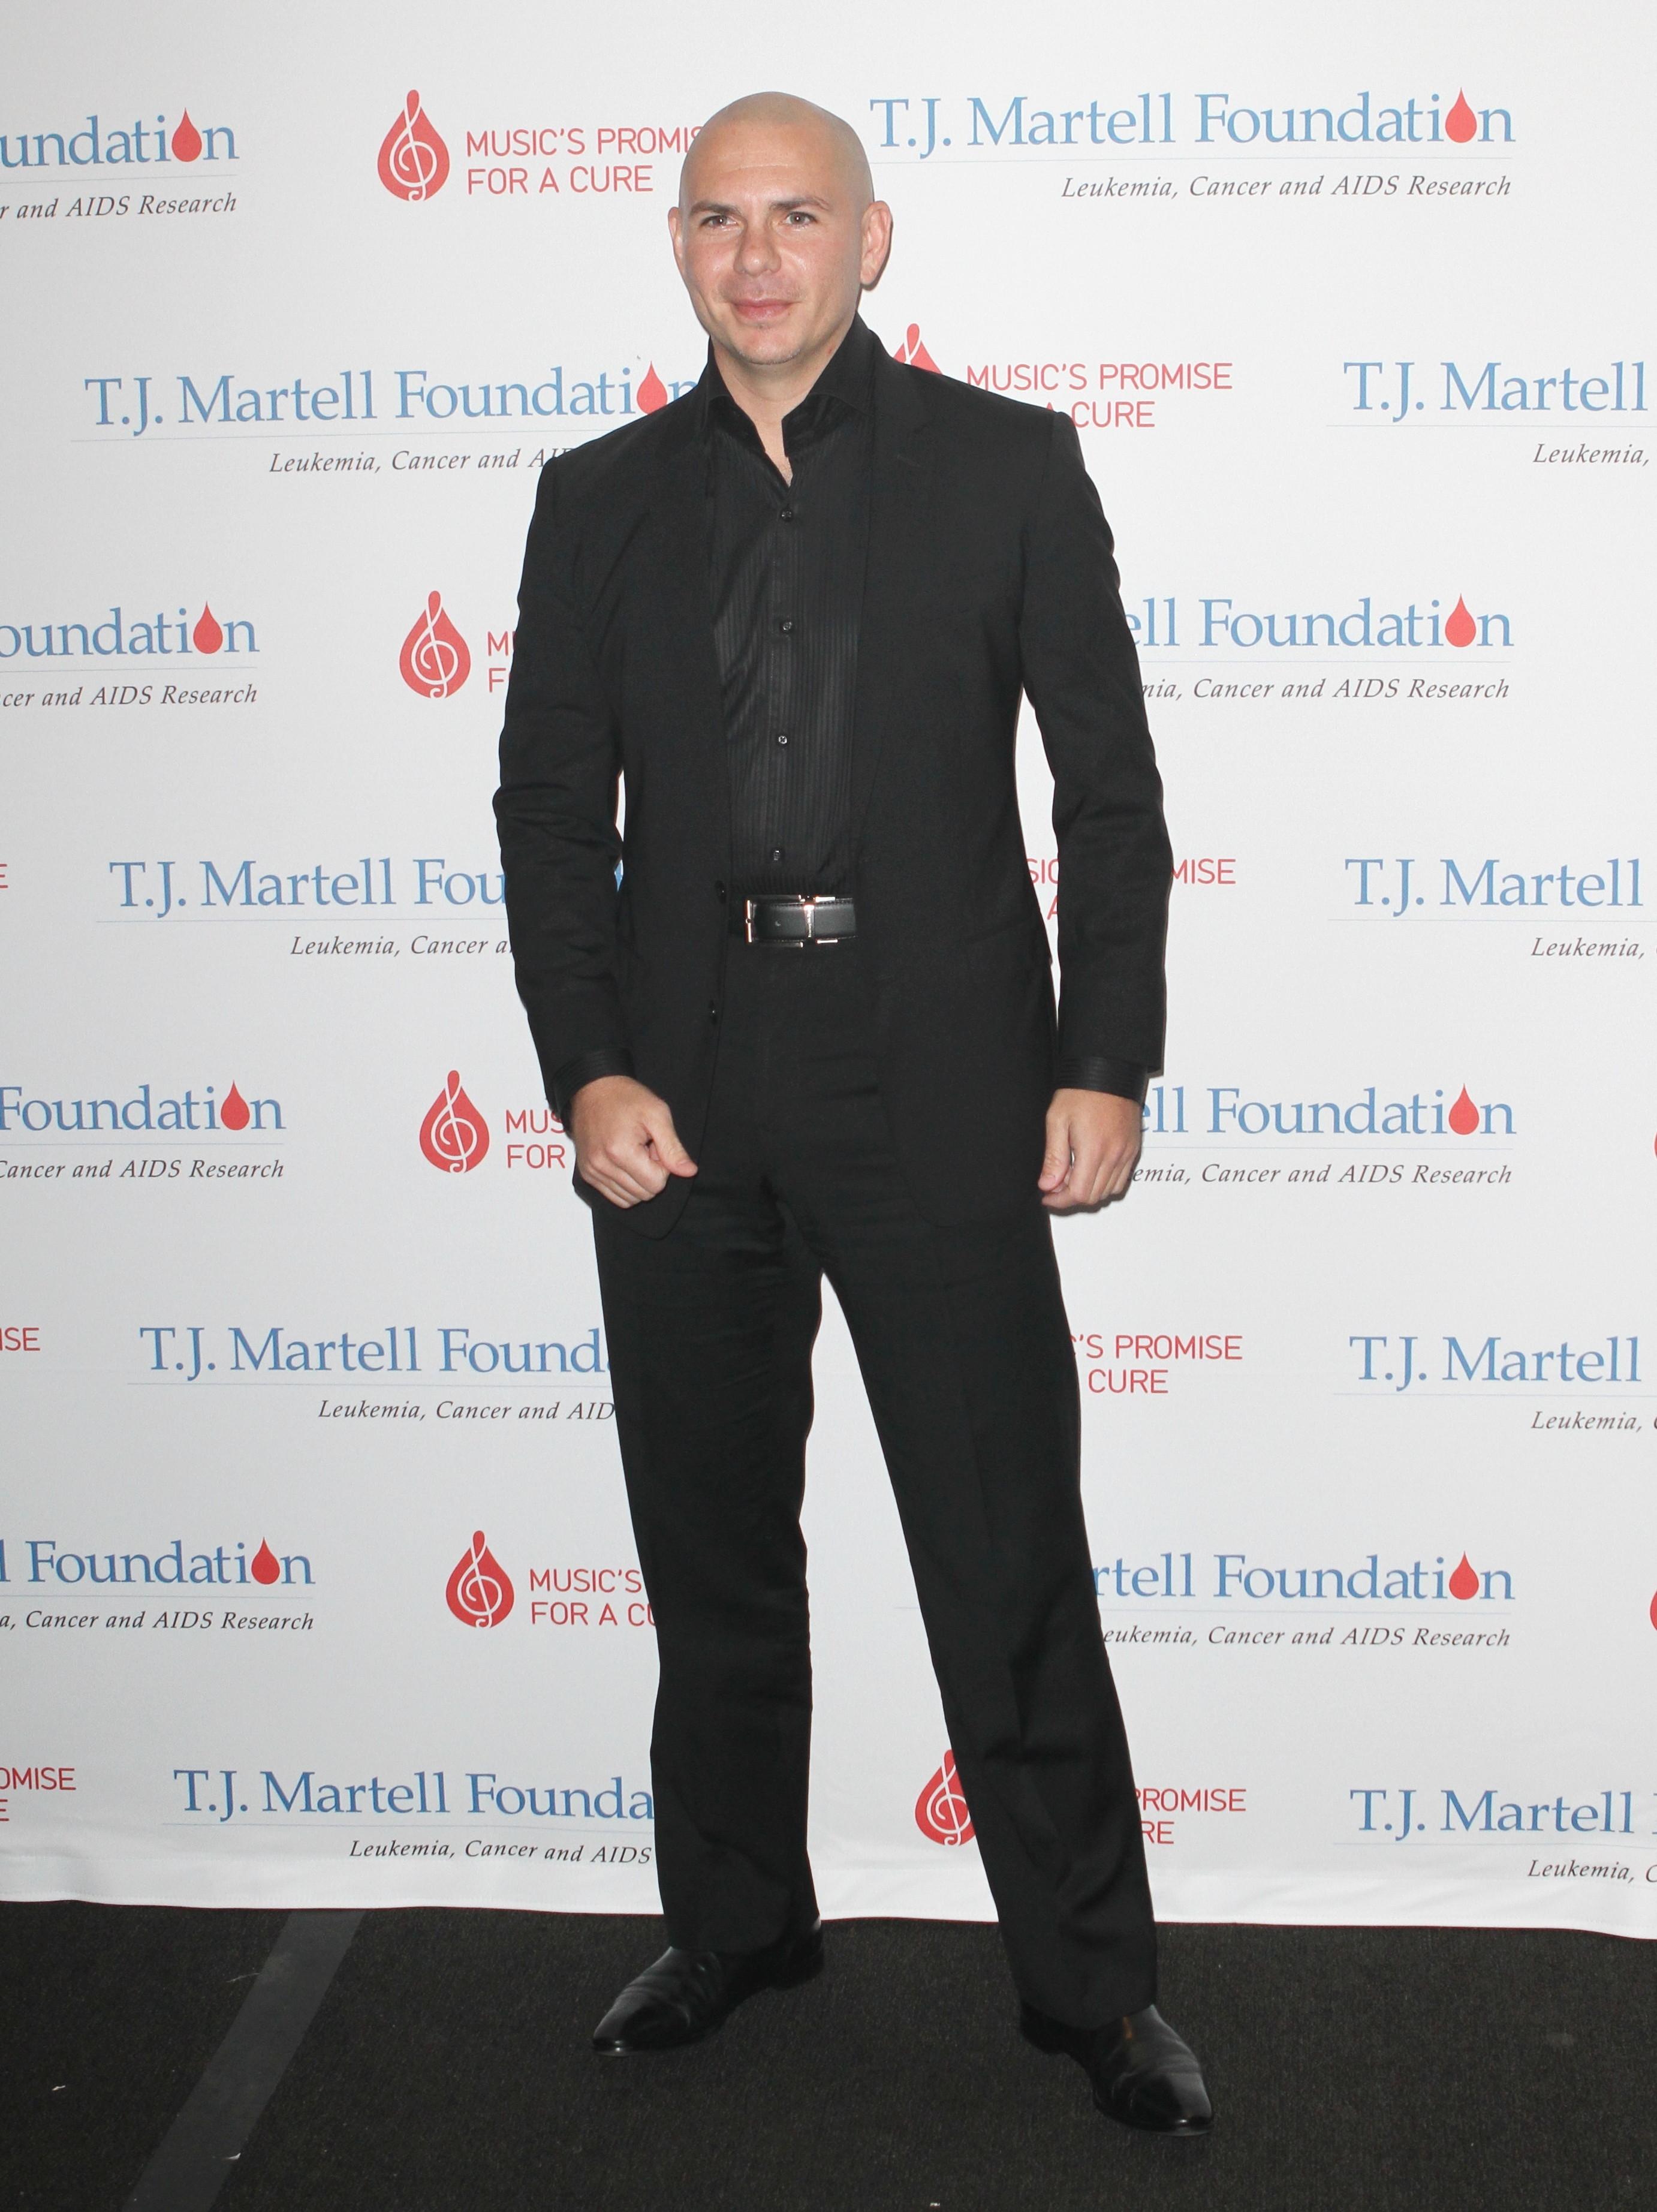 16. Pitbull